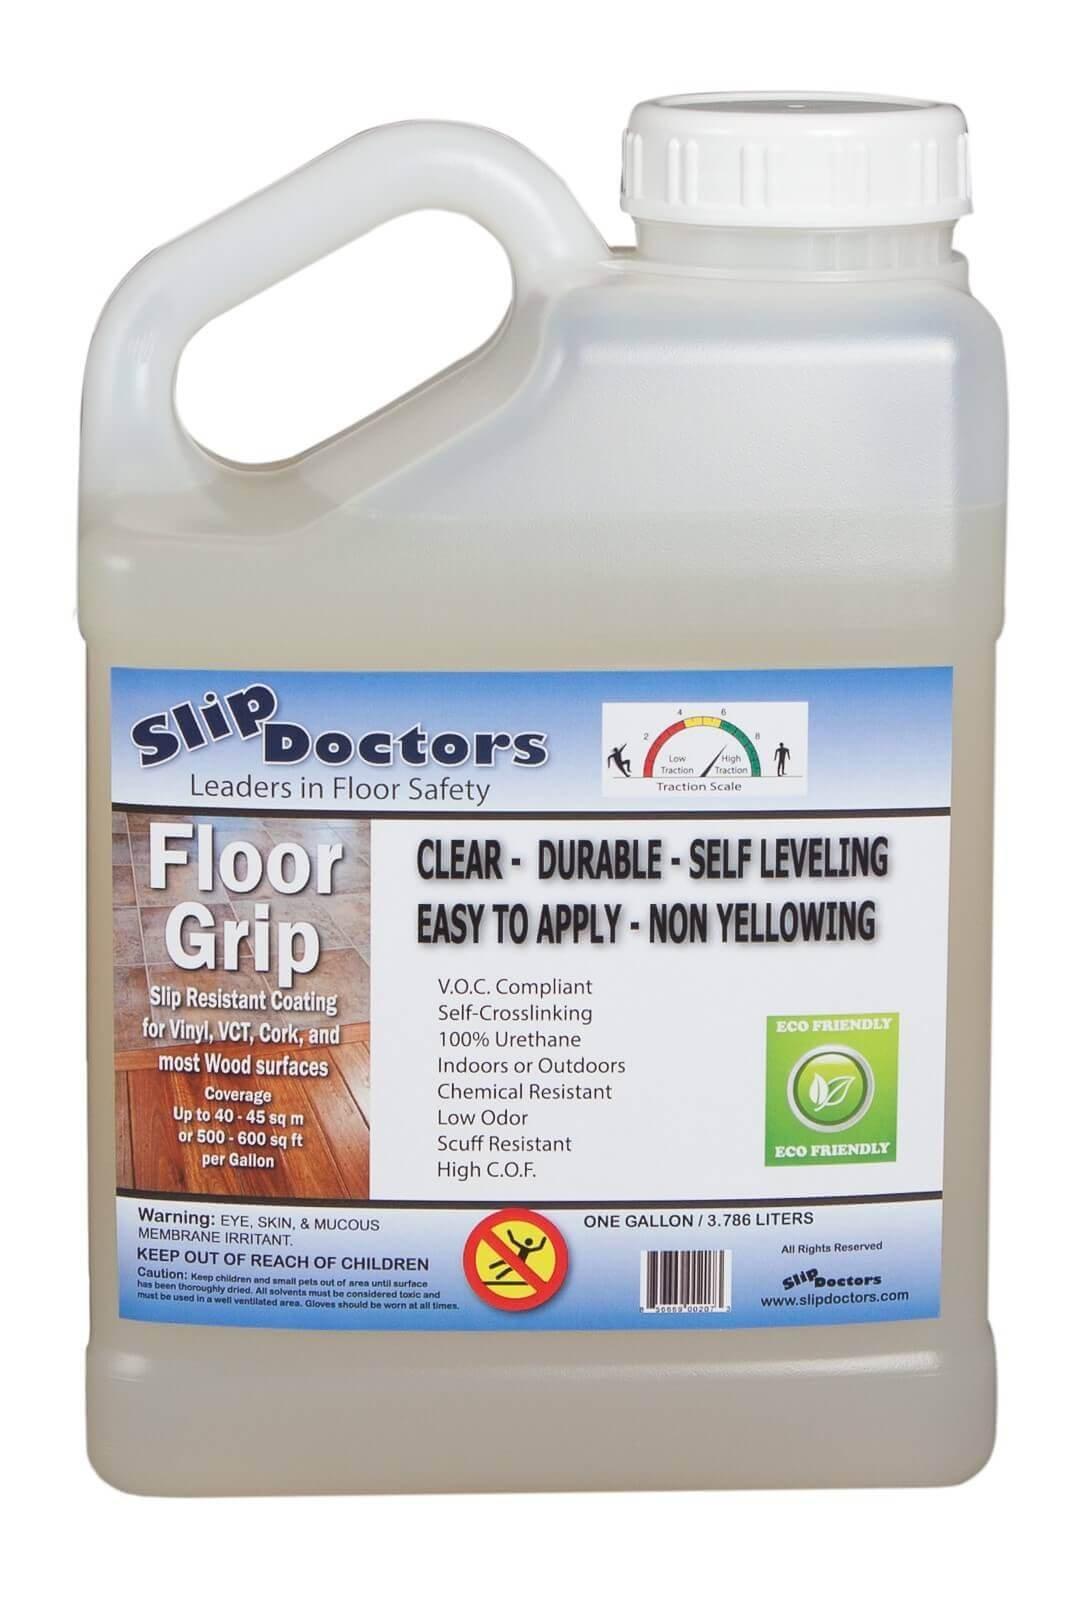 SlipDoctors Floor Grip Floor Treatment, 1 Gallon Bottle, Clear